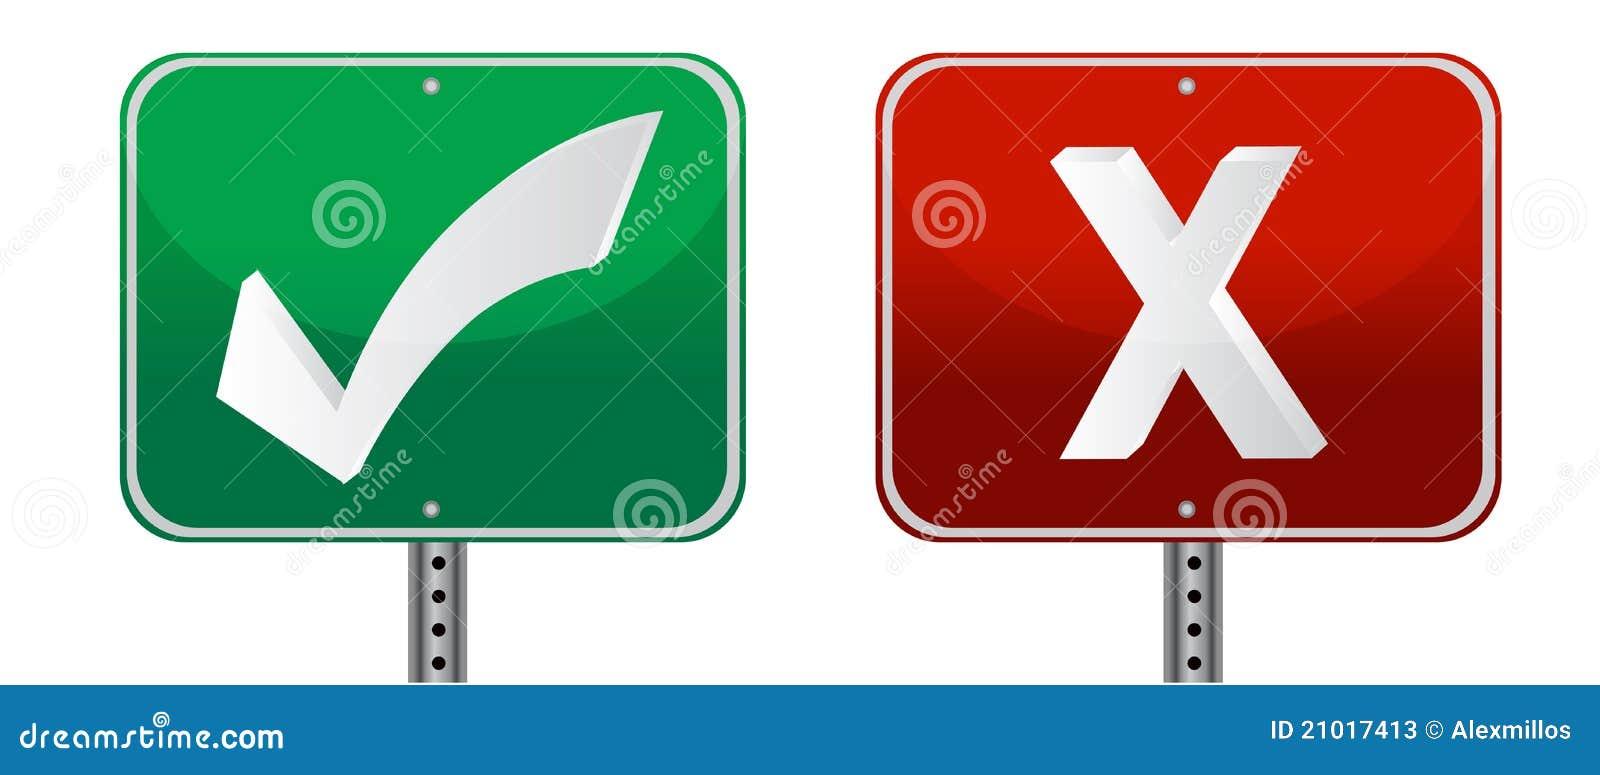 No Credit Check Credit Cards >> Check And X Mark Signs Stock Photos - Image: 21017413